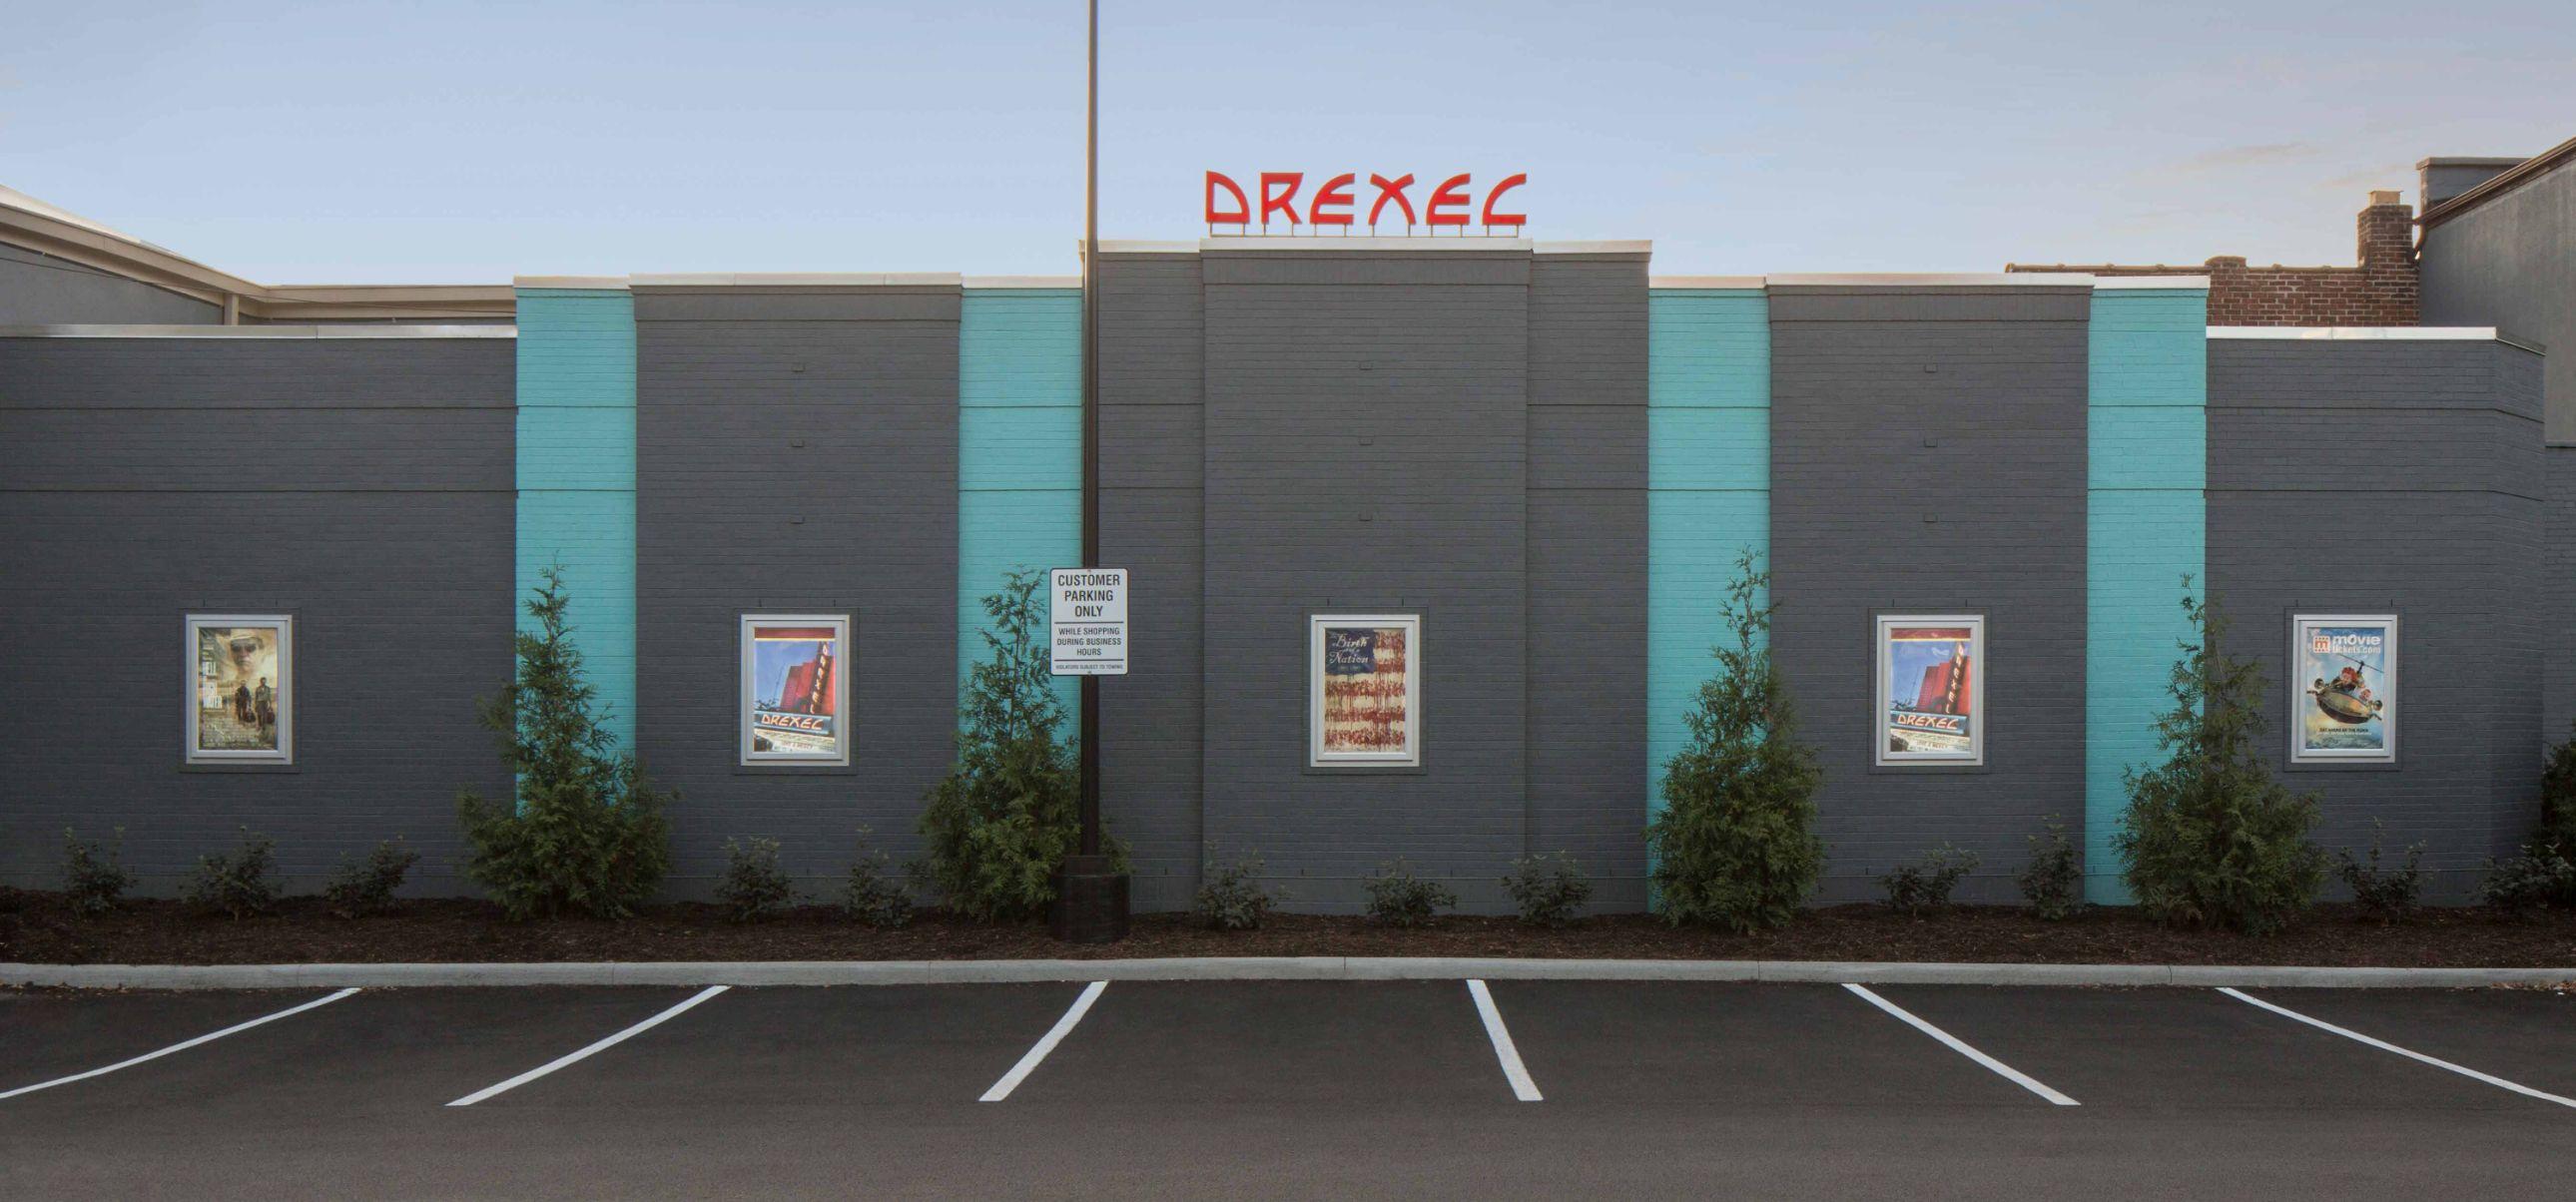 Drexel-parking.jpg